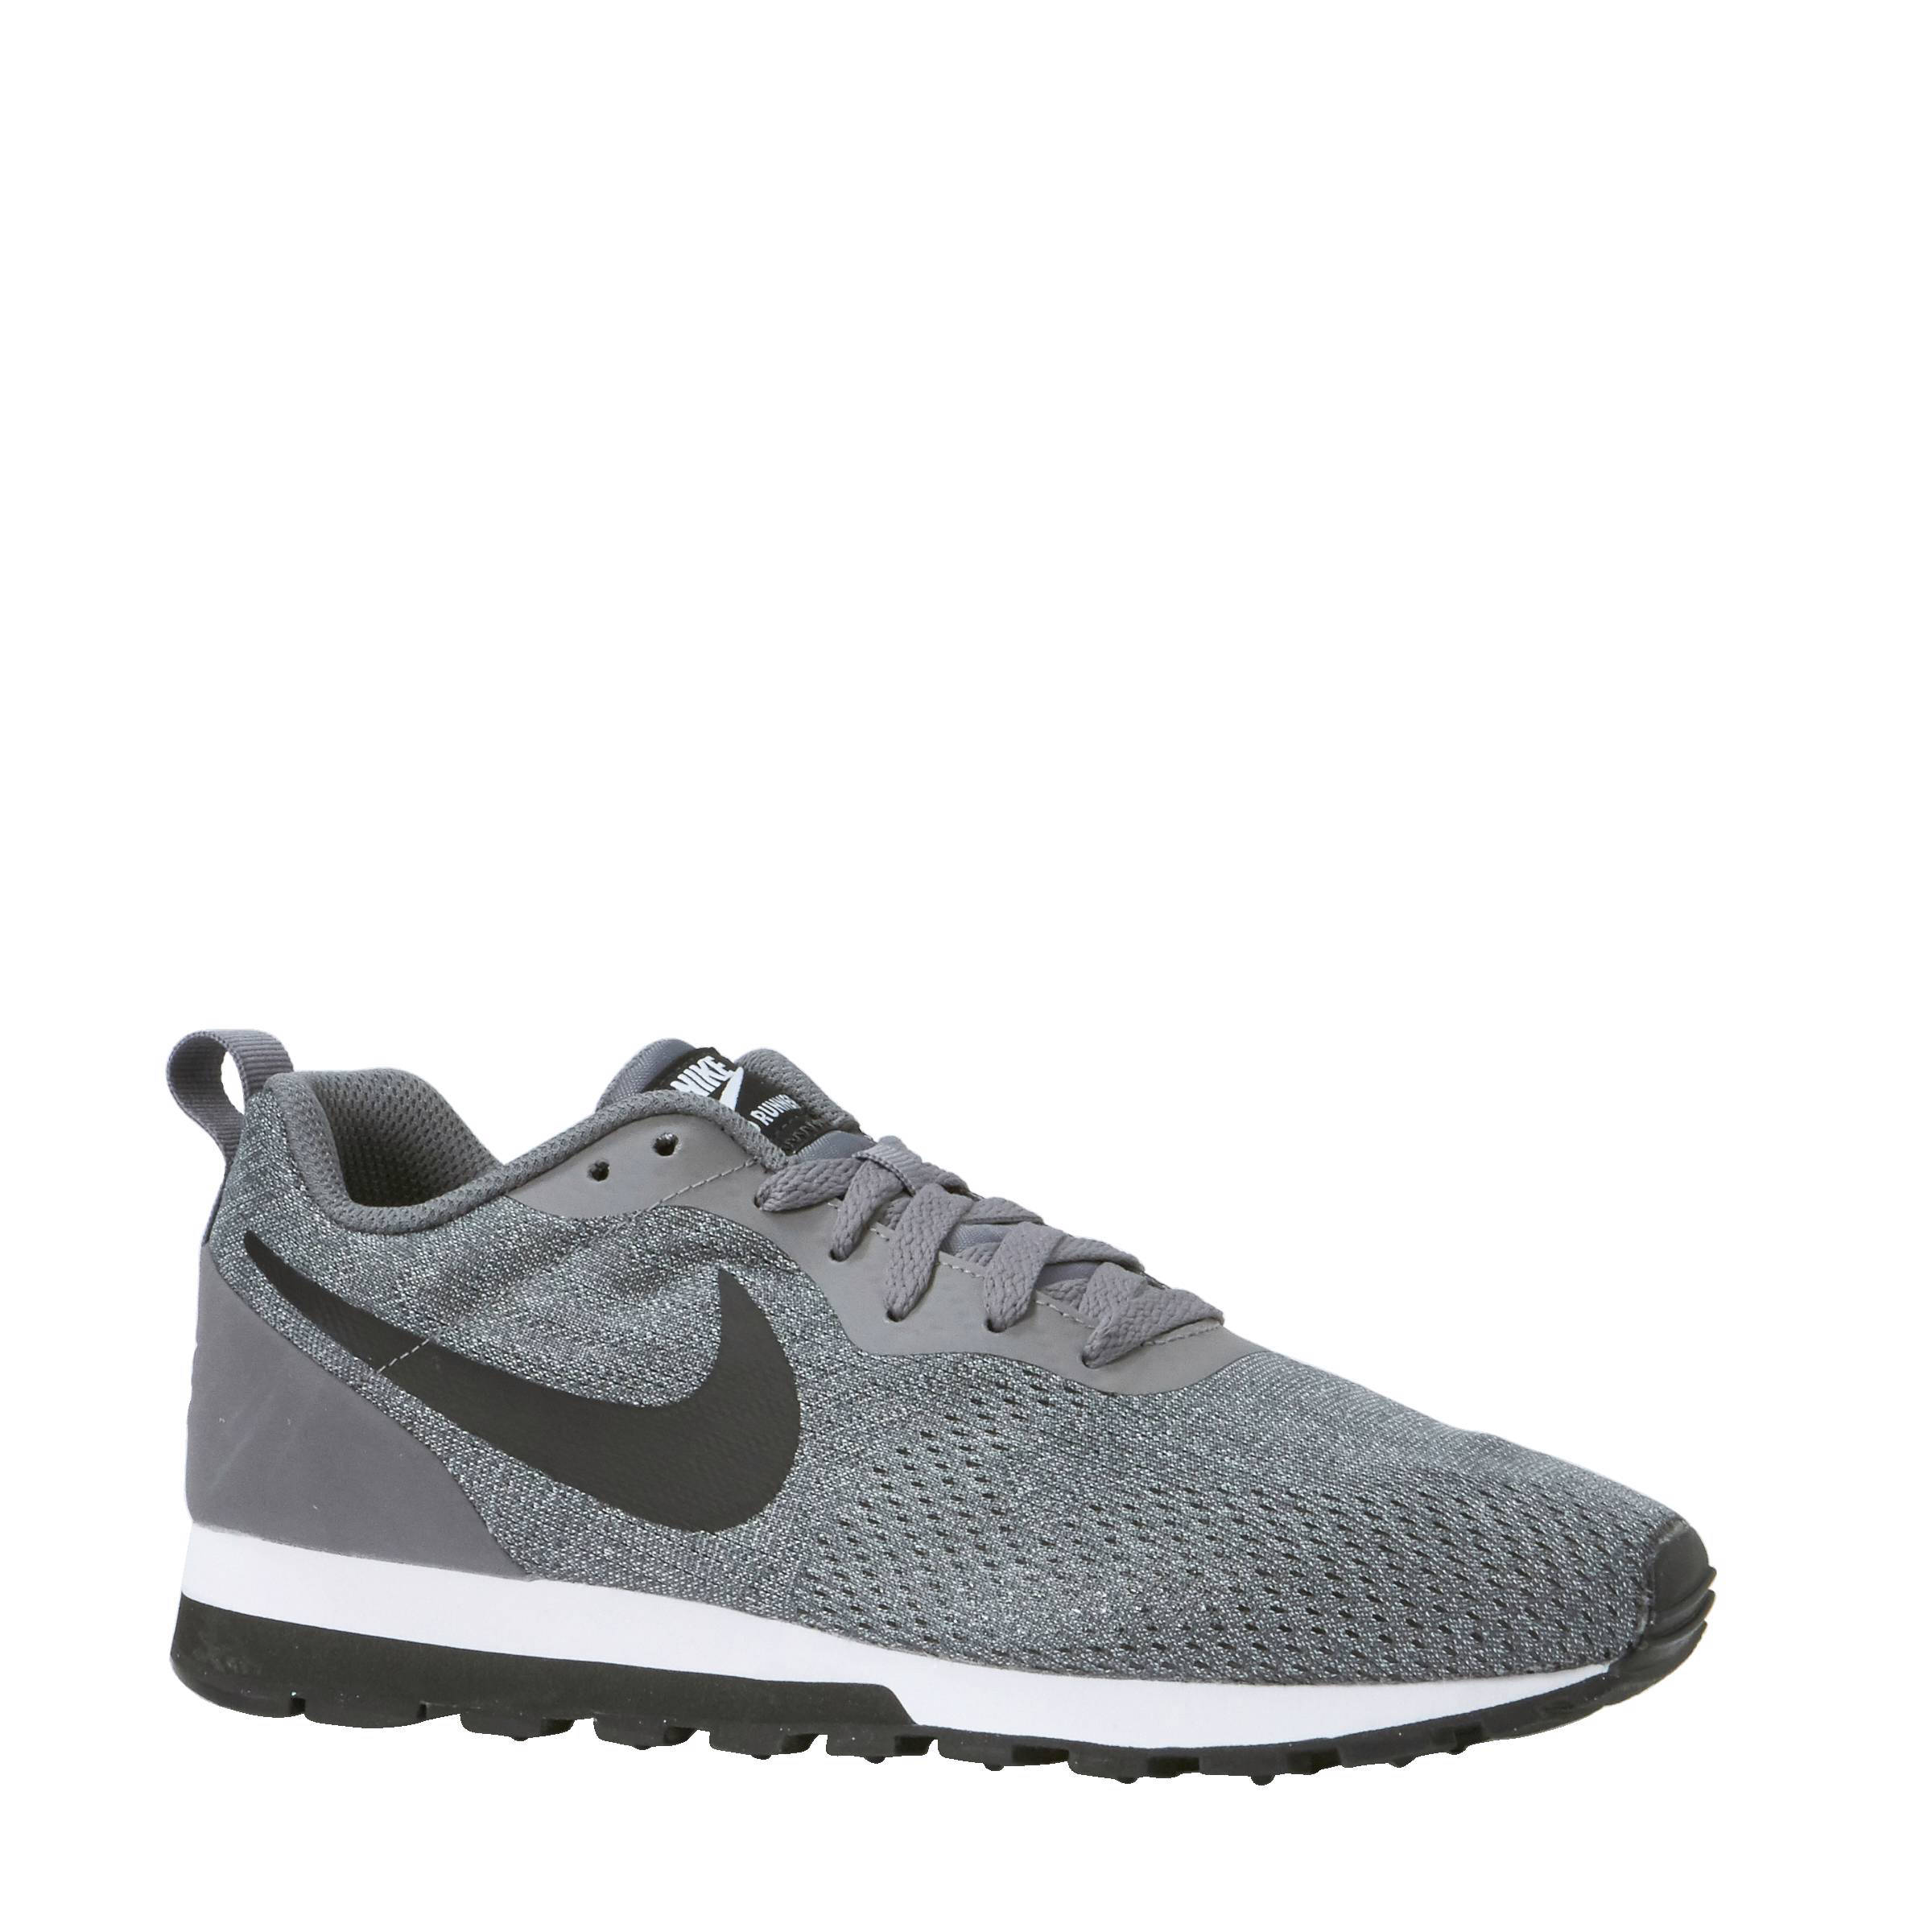 MD Runner 2 Eng Mesh sneakers